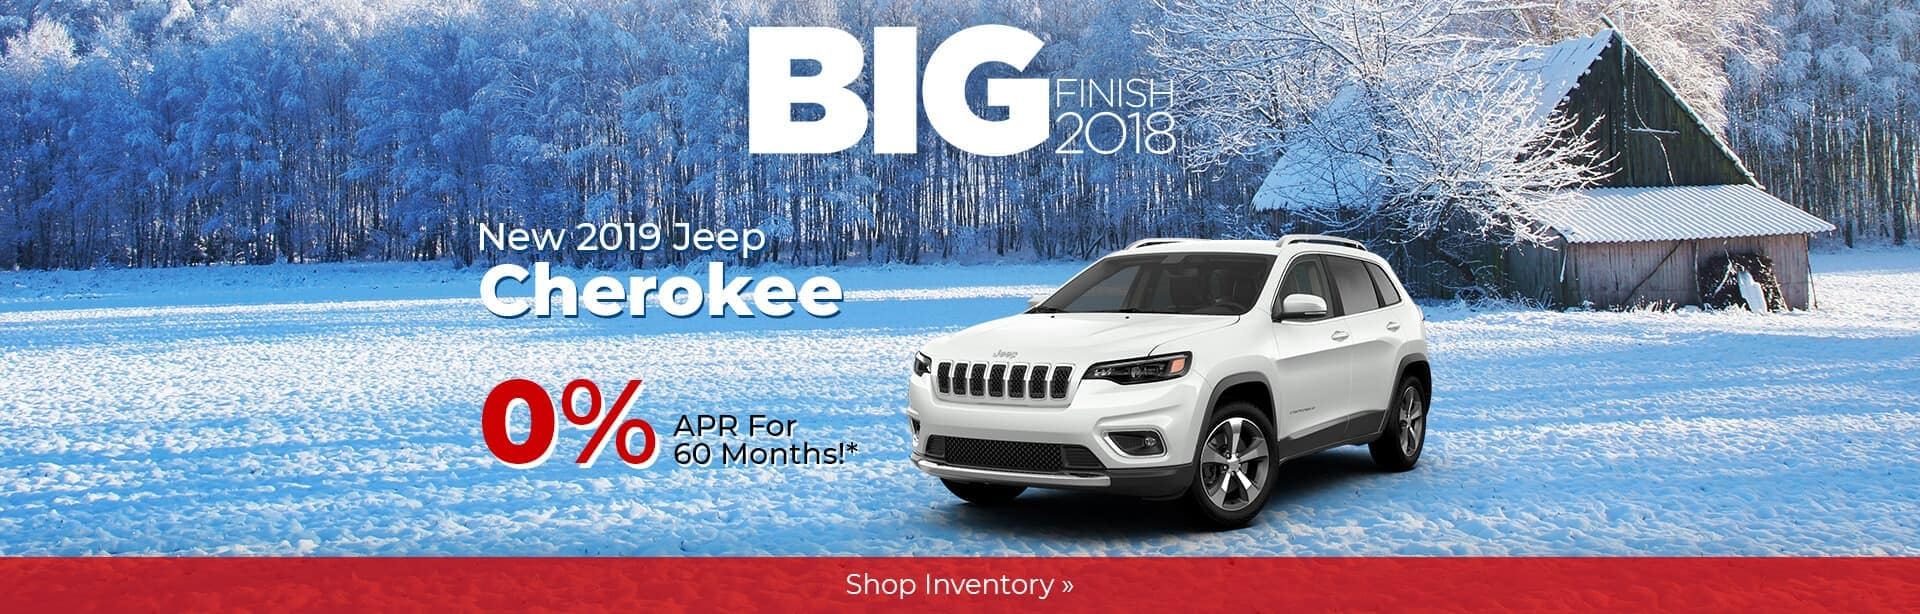 2019 Jeep Cherokee Big Finish Holiday Savings near Indianapolis.